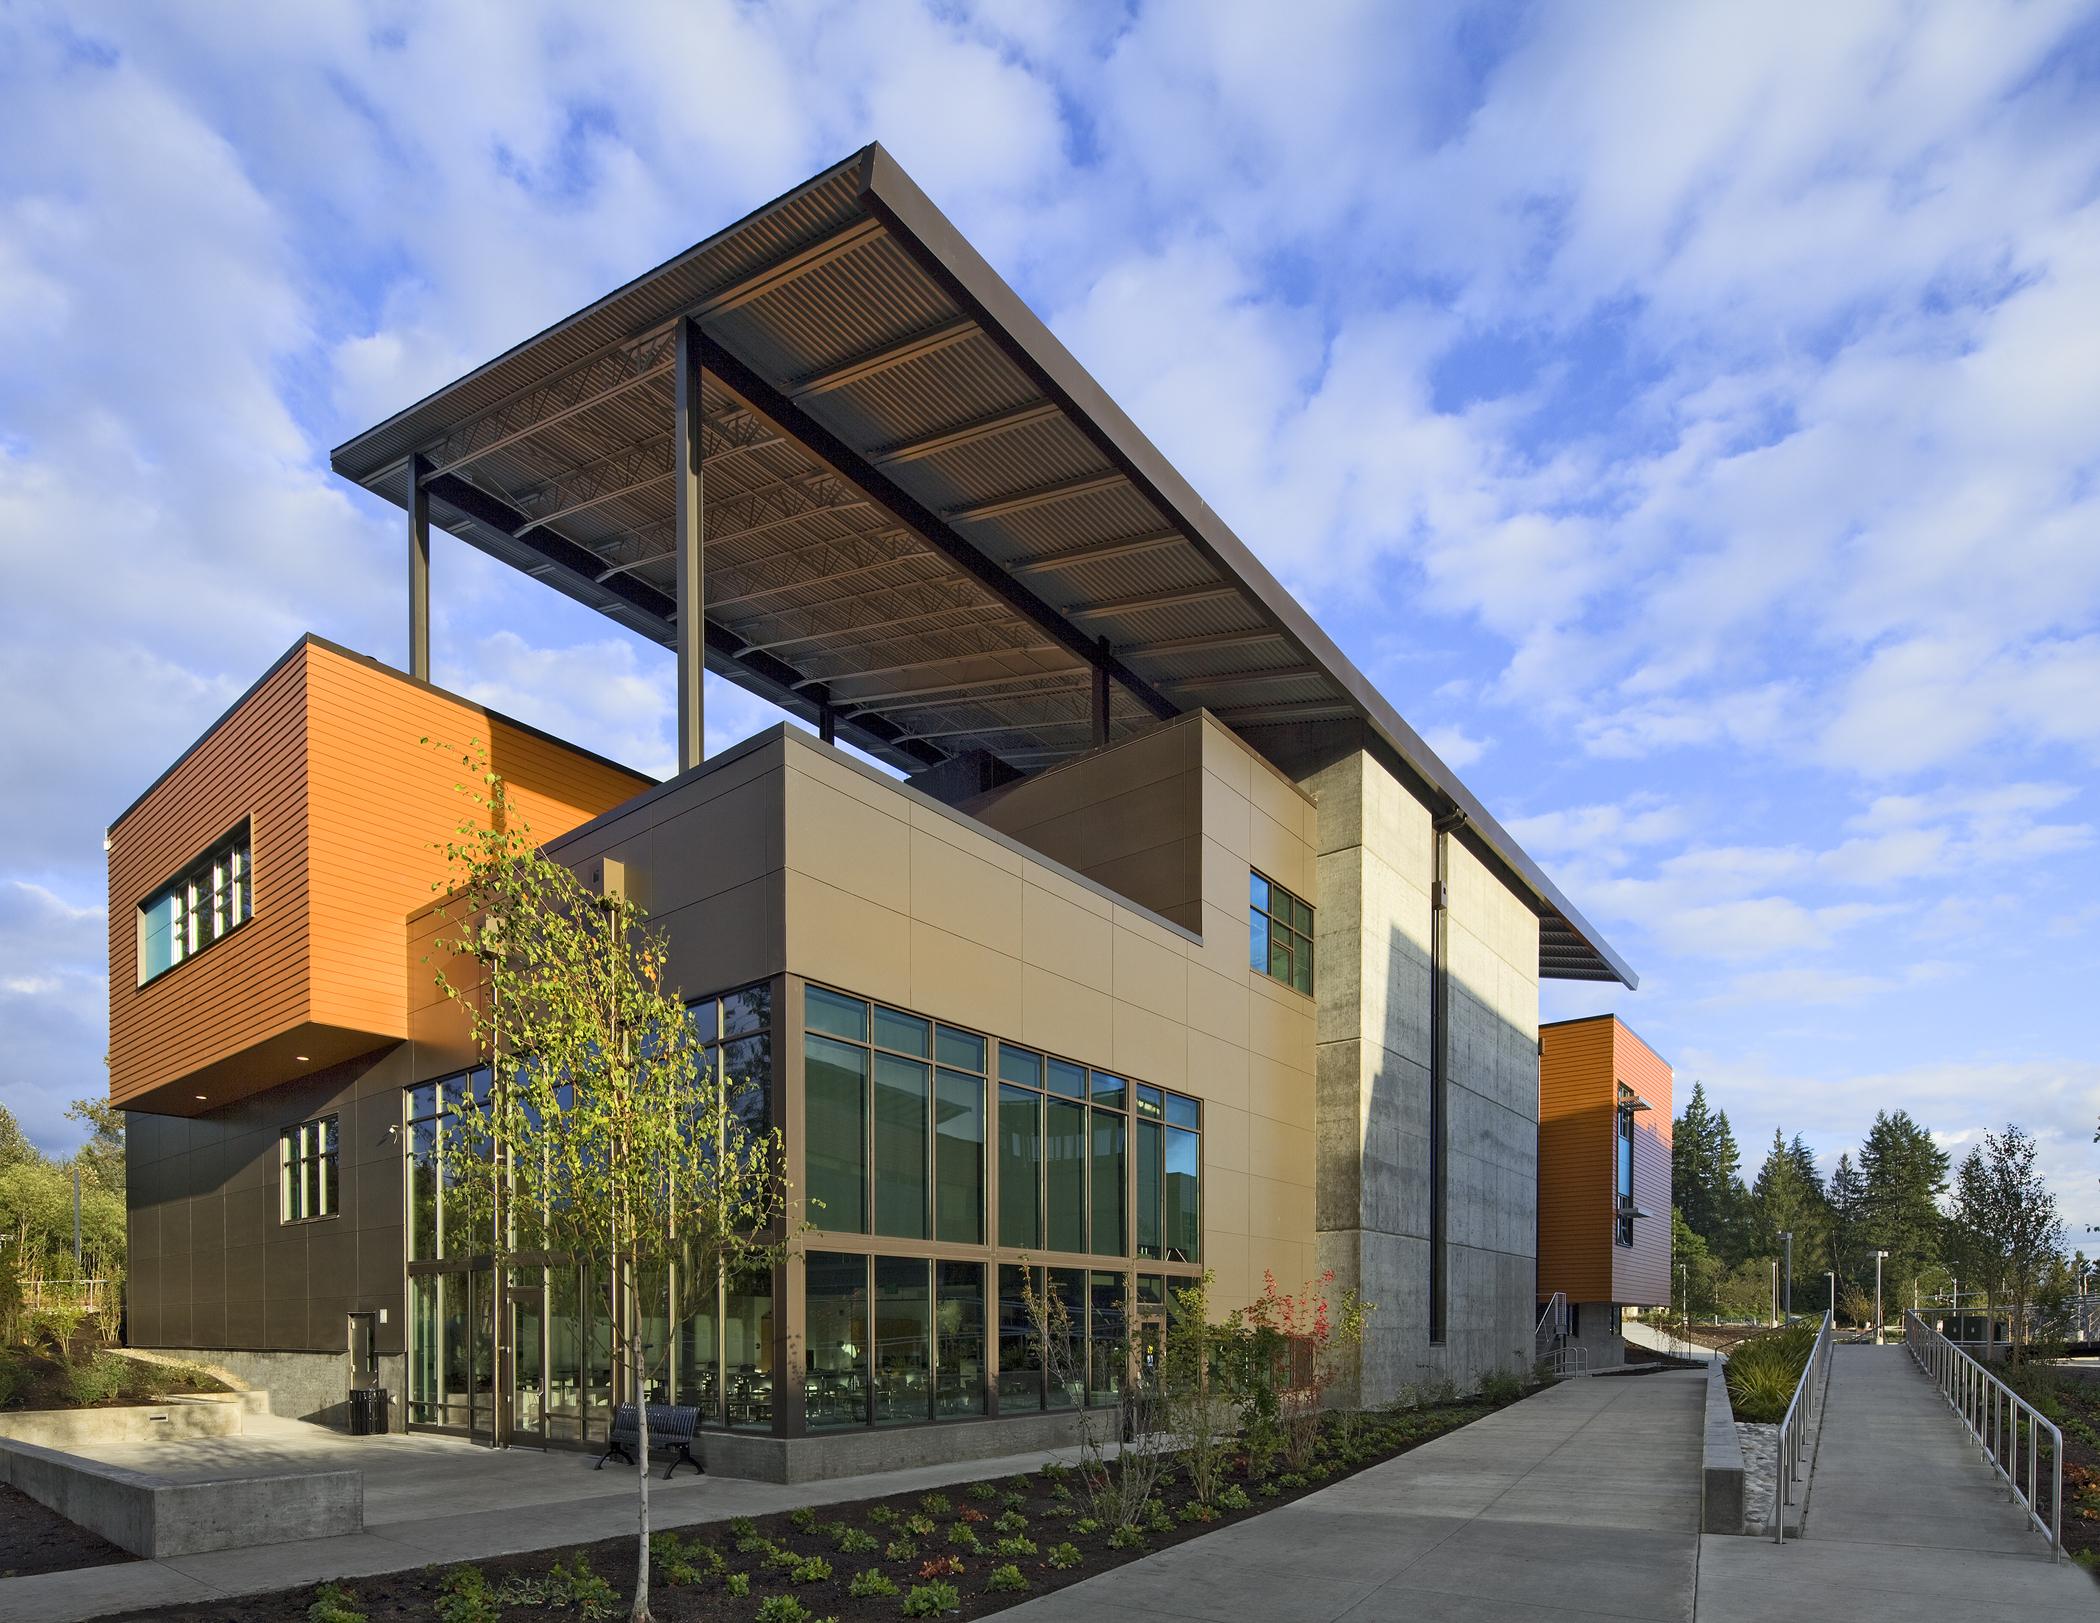 Marysville Getchell High School | Architect Magazine | DLR Group,  Marysville, WA, USA, Education, New Construction, Modern, Other 2011, AIA    National ...